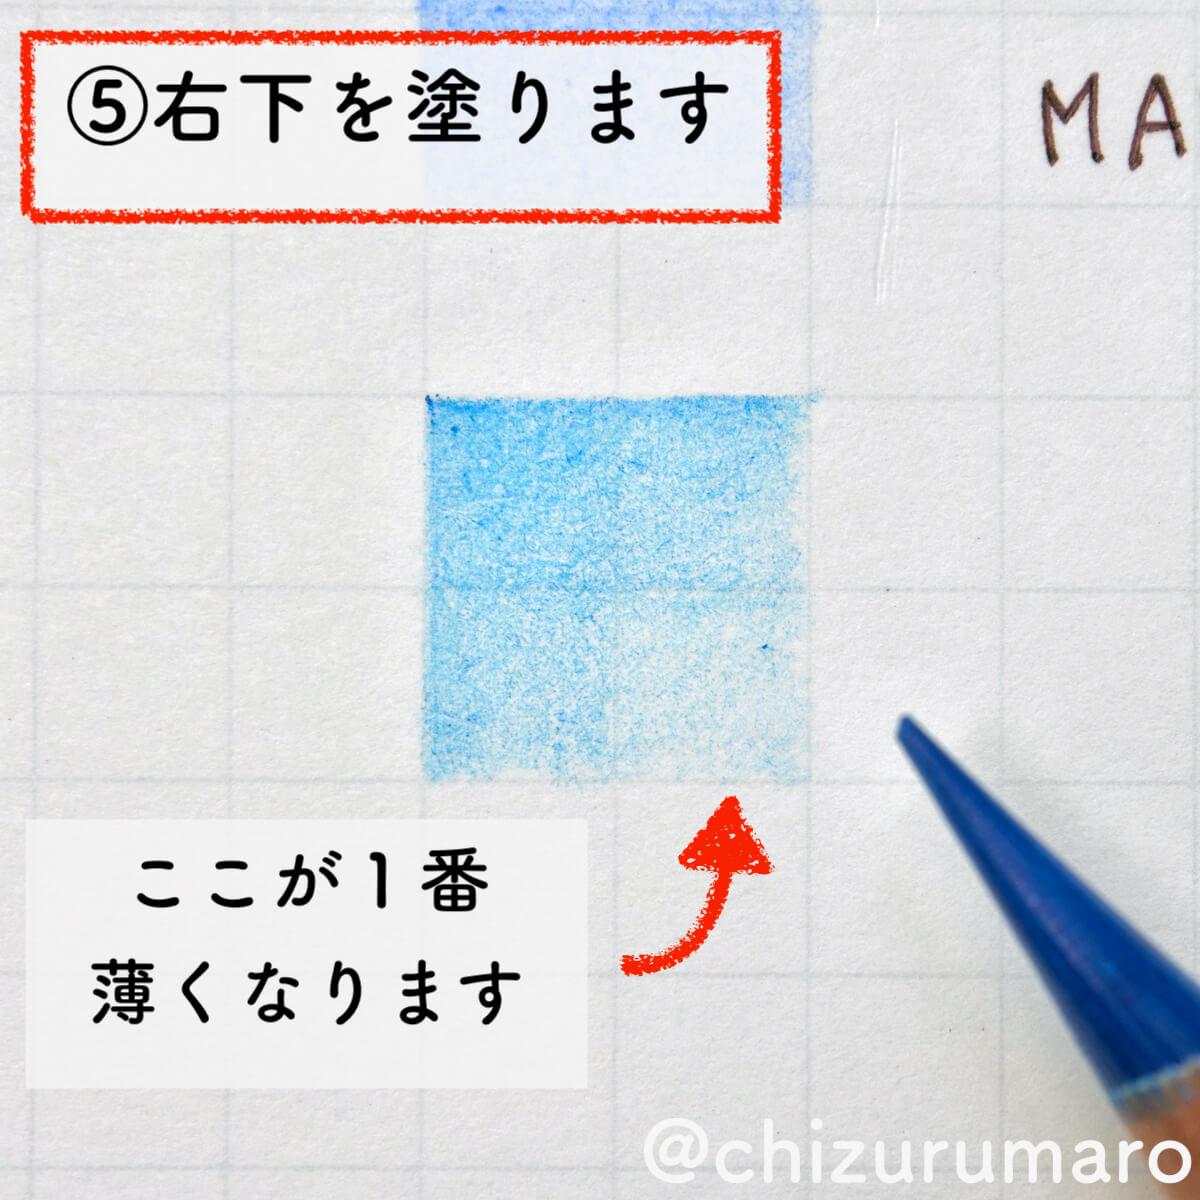 f:id:chizurumaro:20200921220140j:plain